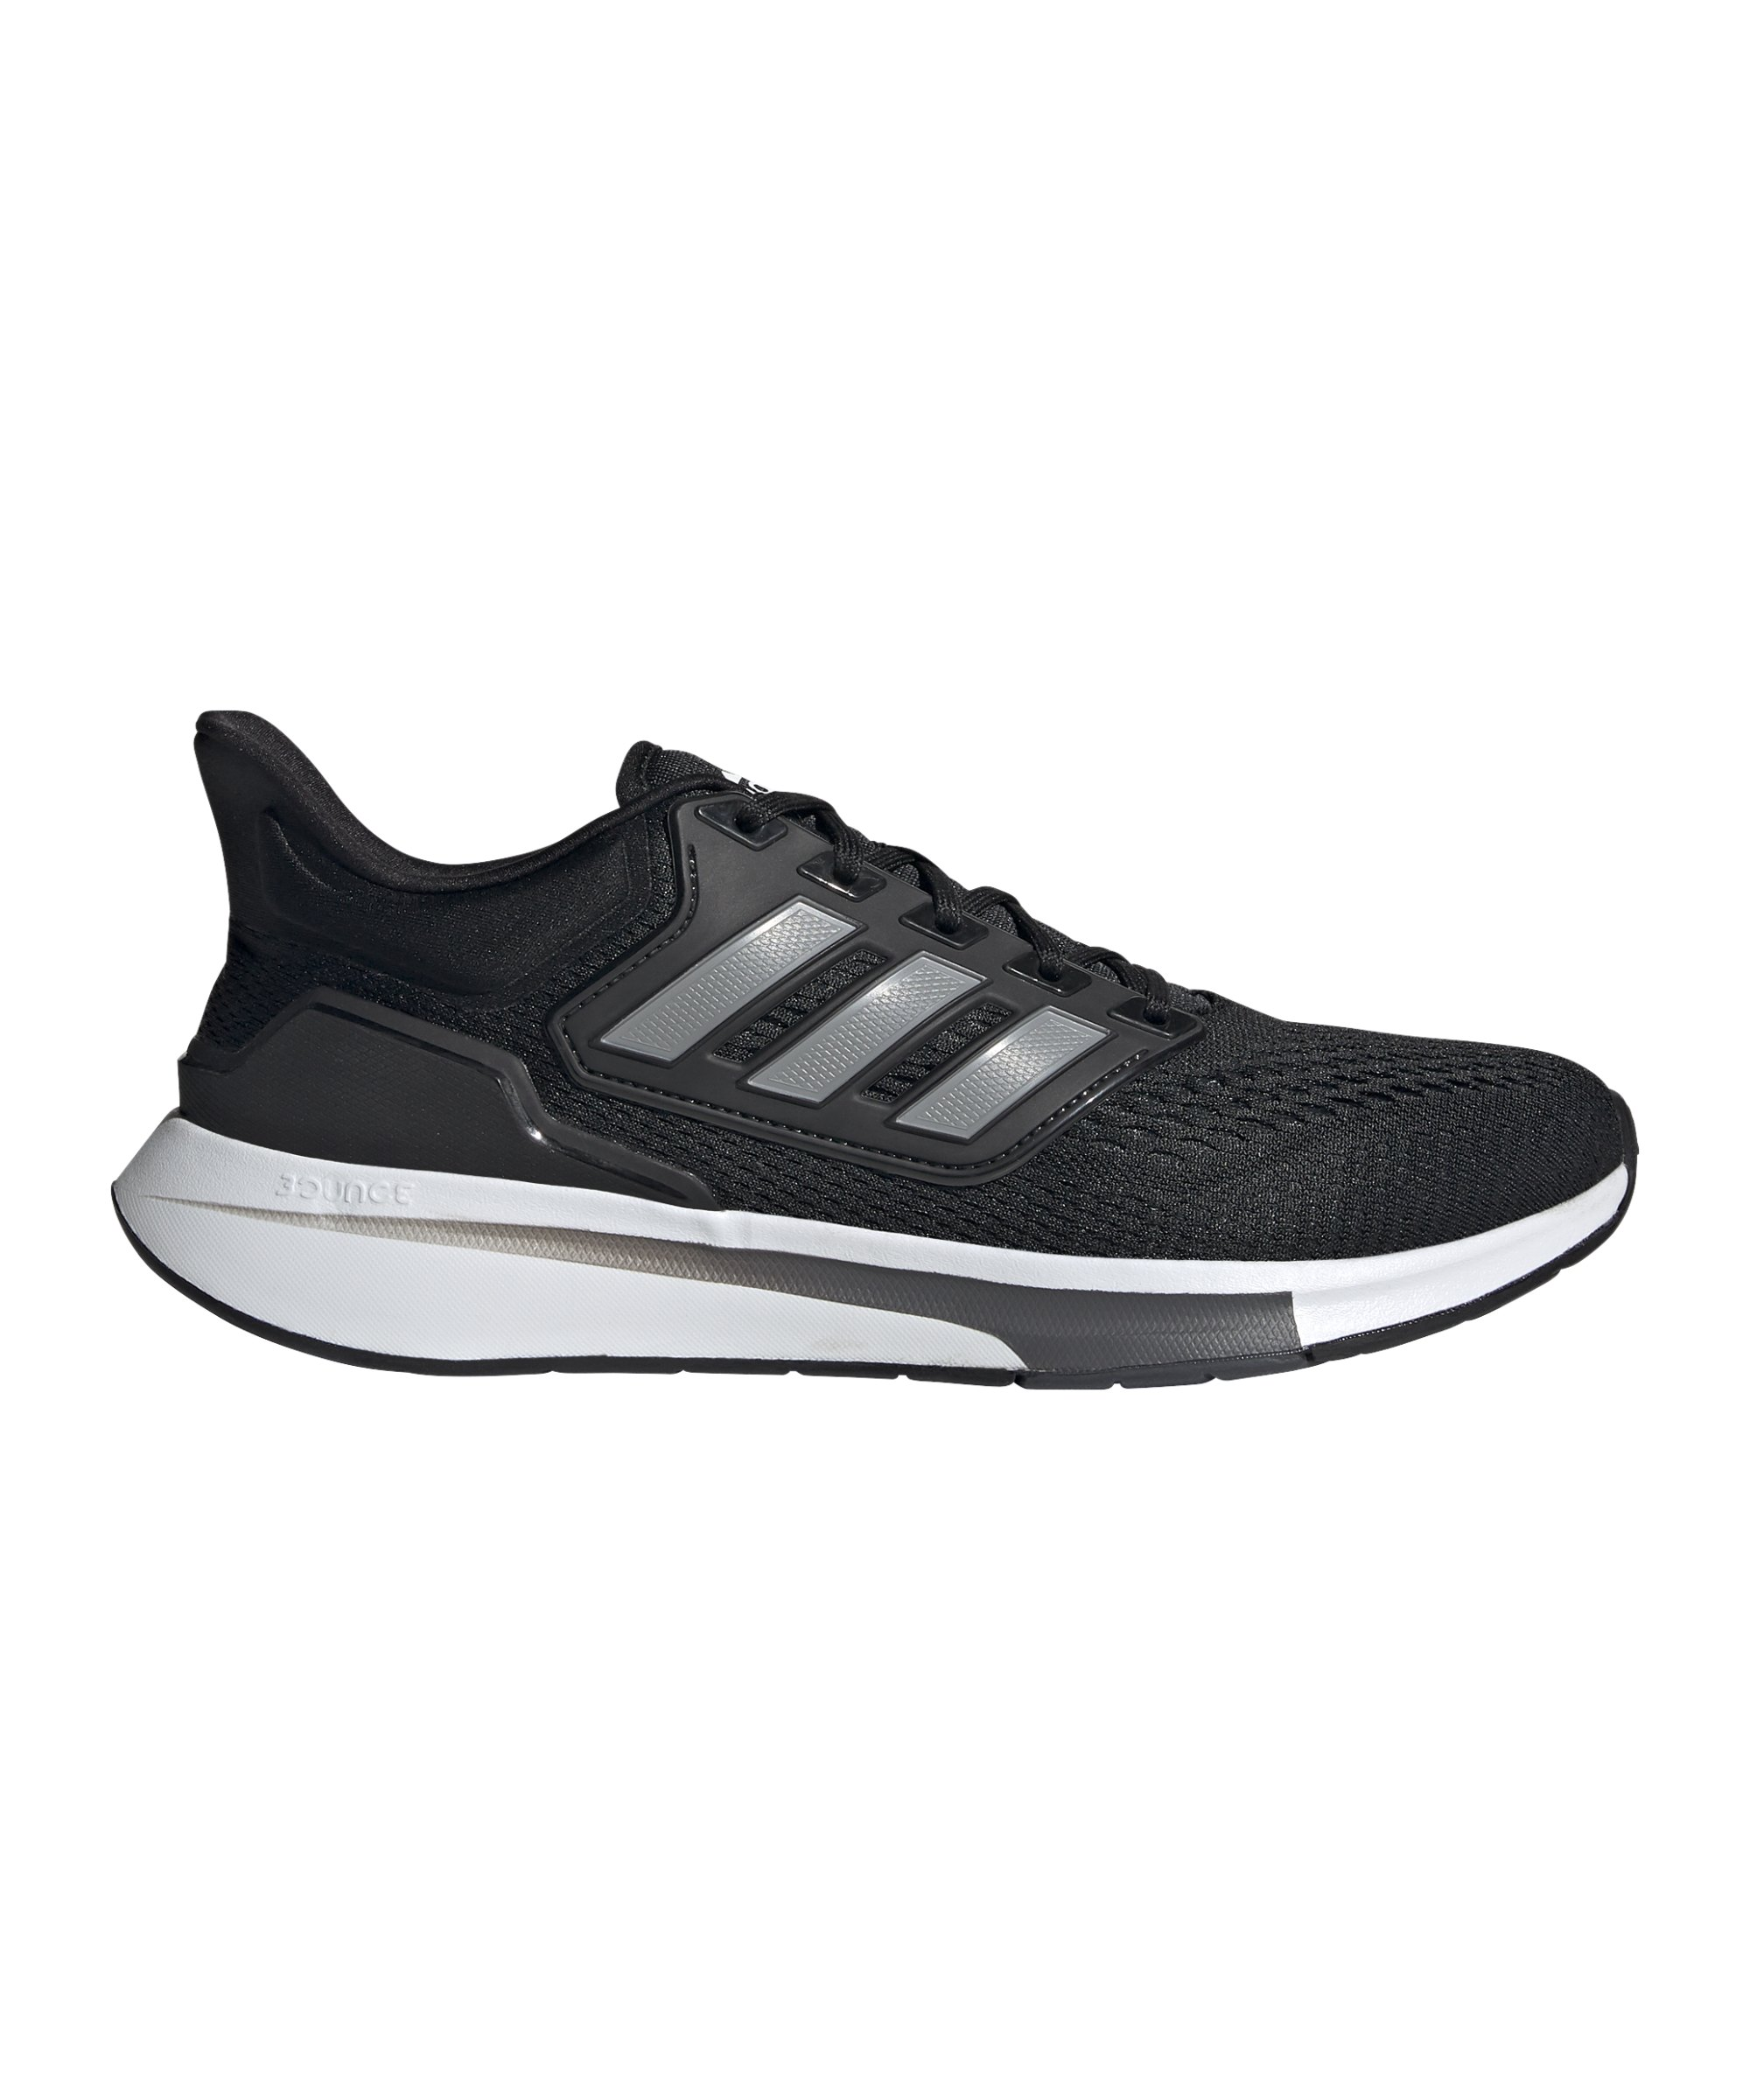 adidas EQ21 Running Schwarz Grau - schwarz